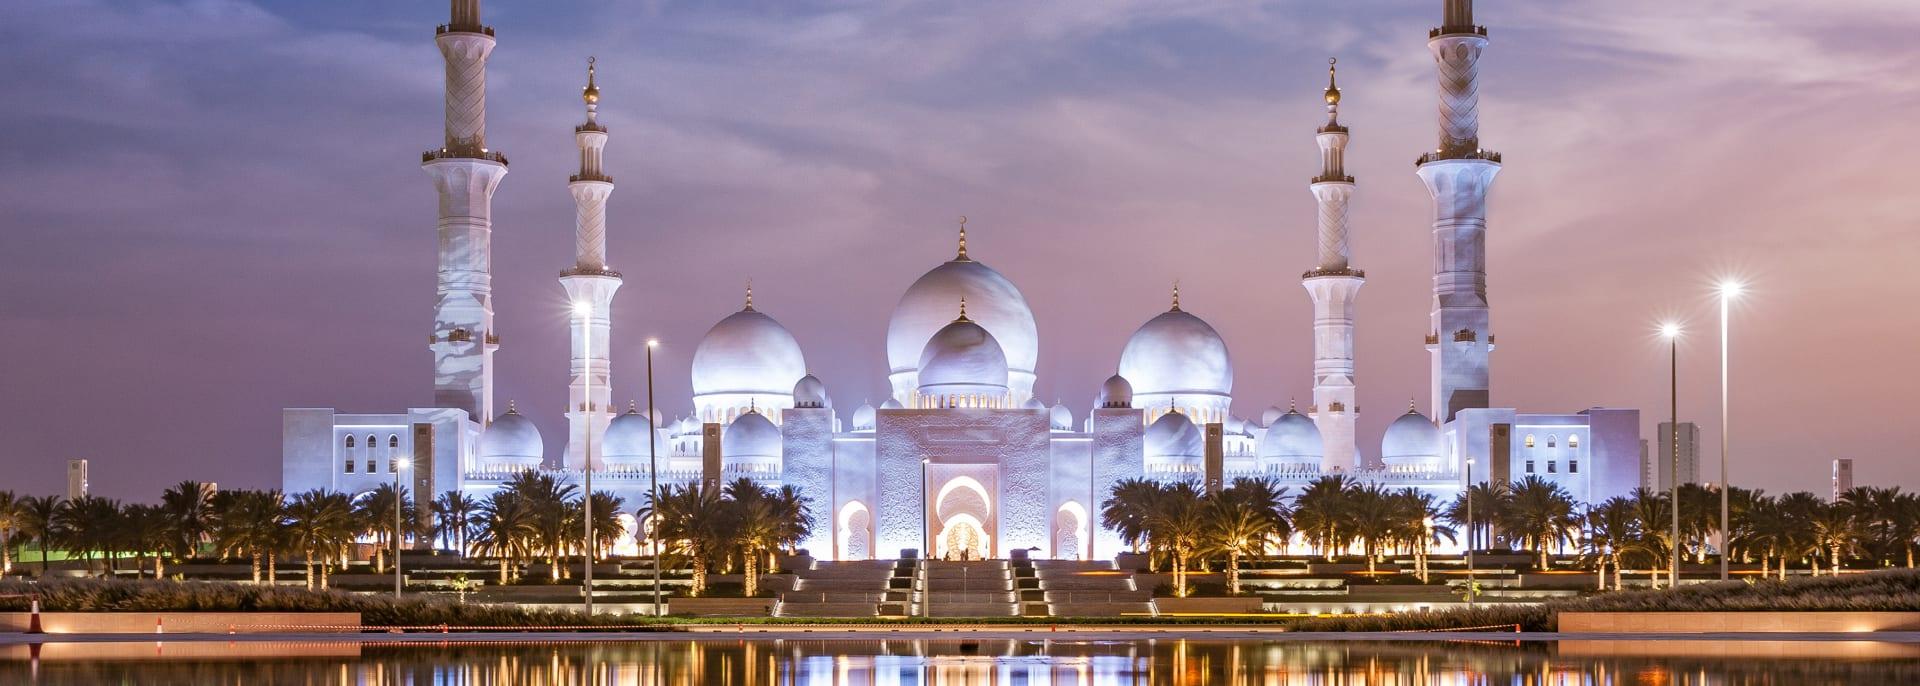 Sheik Zayed Grand Moschee , Dubai